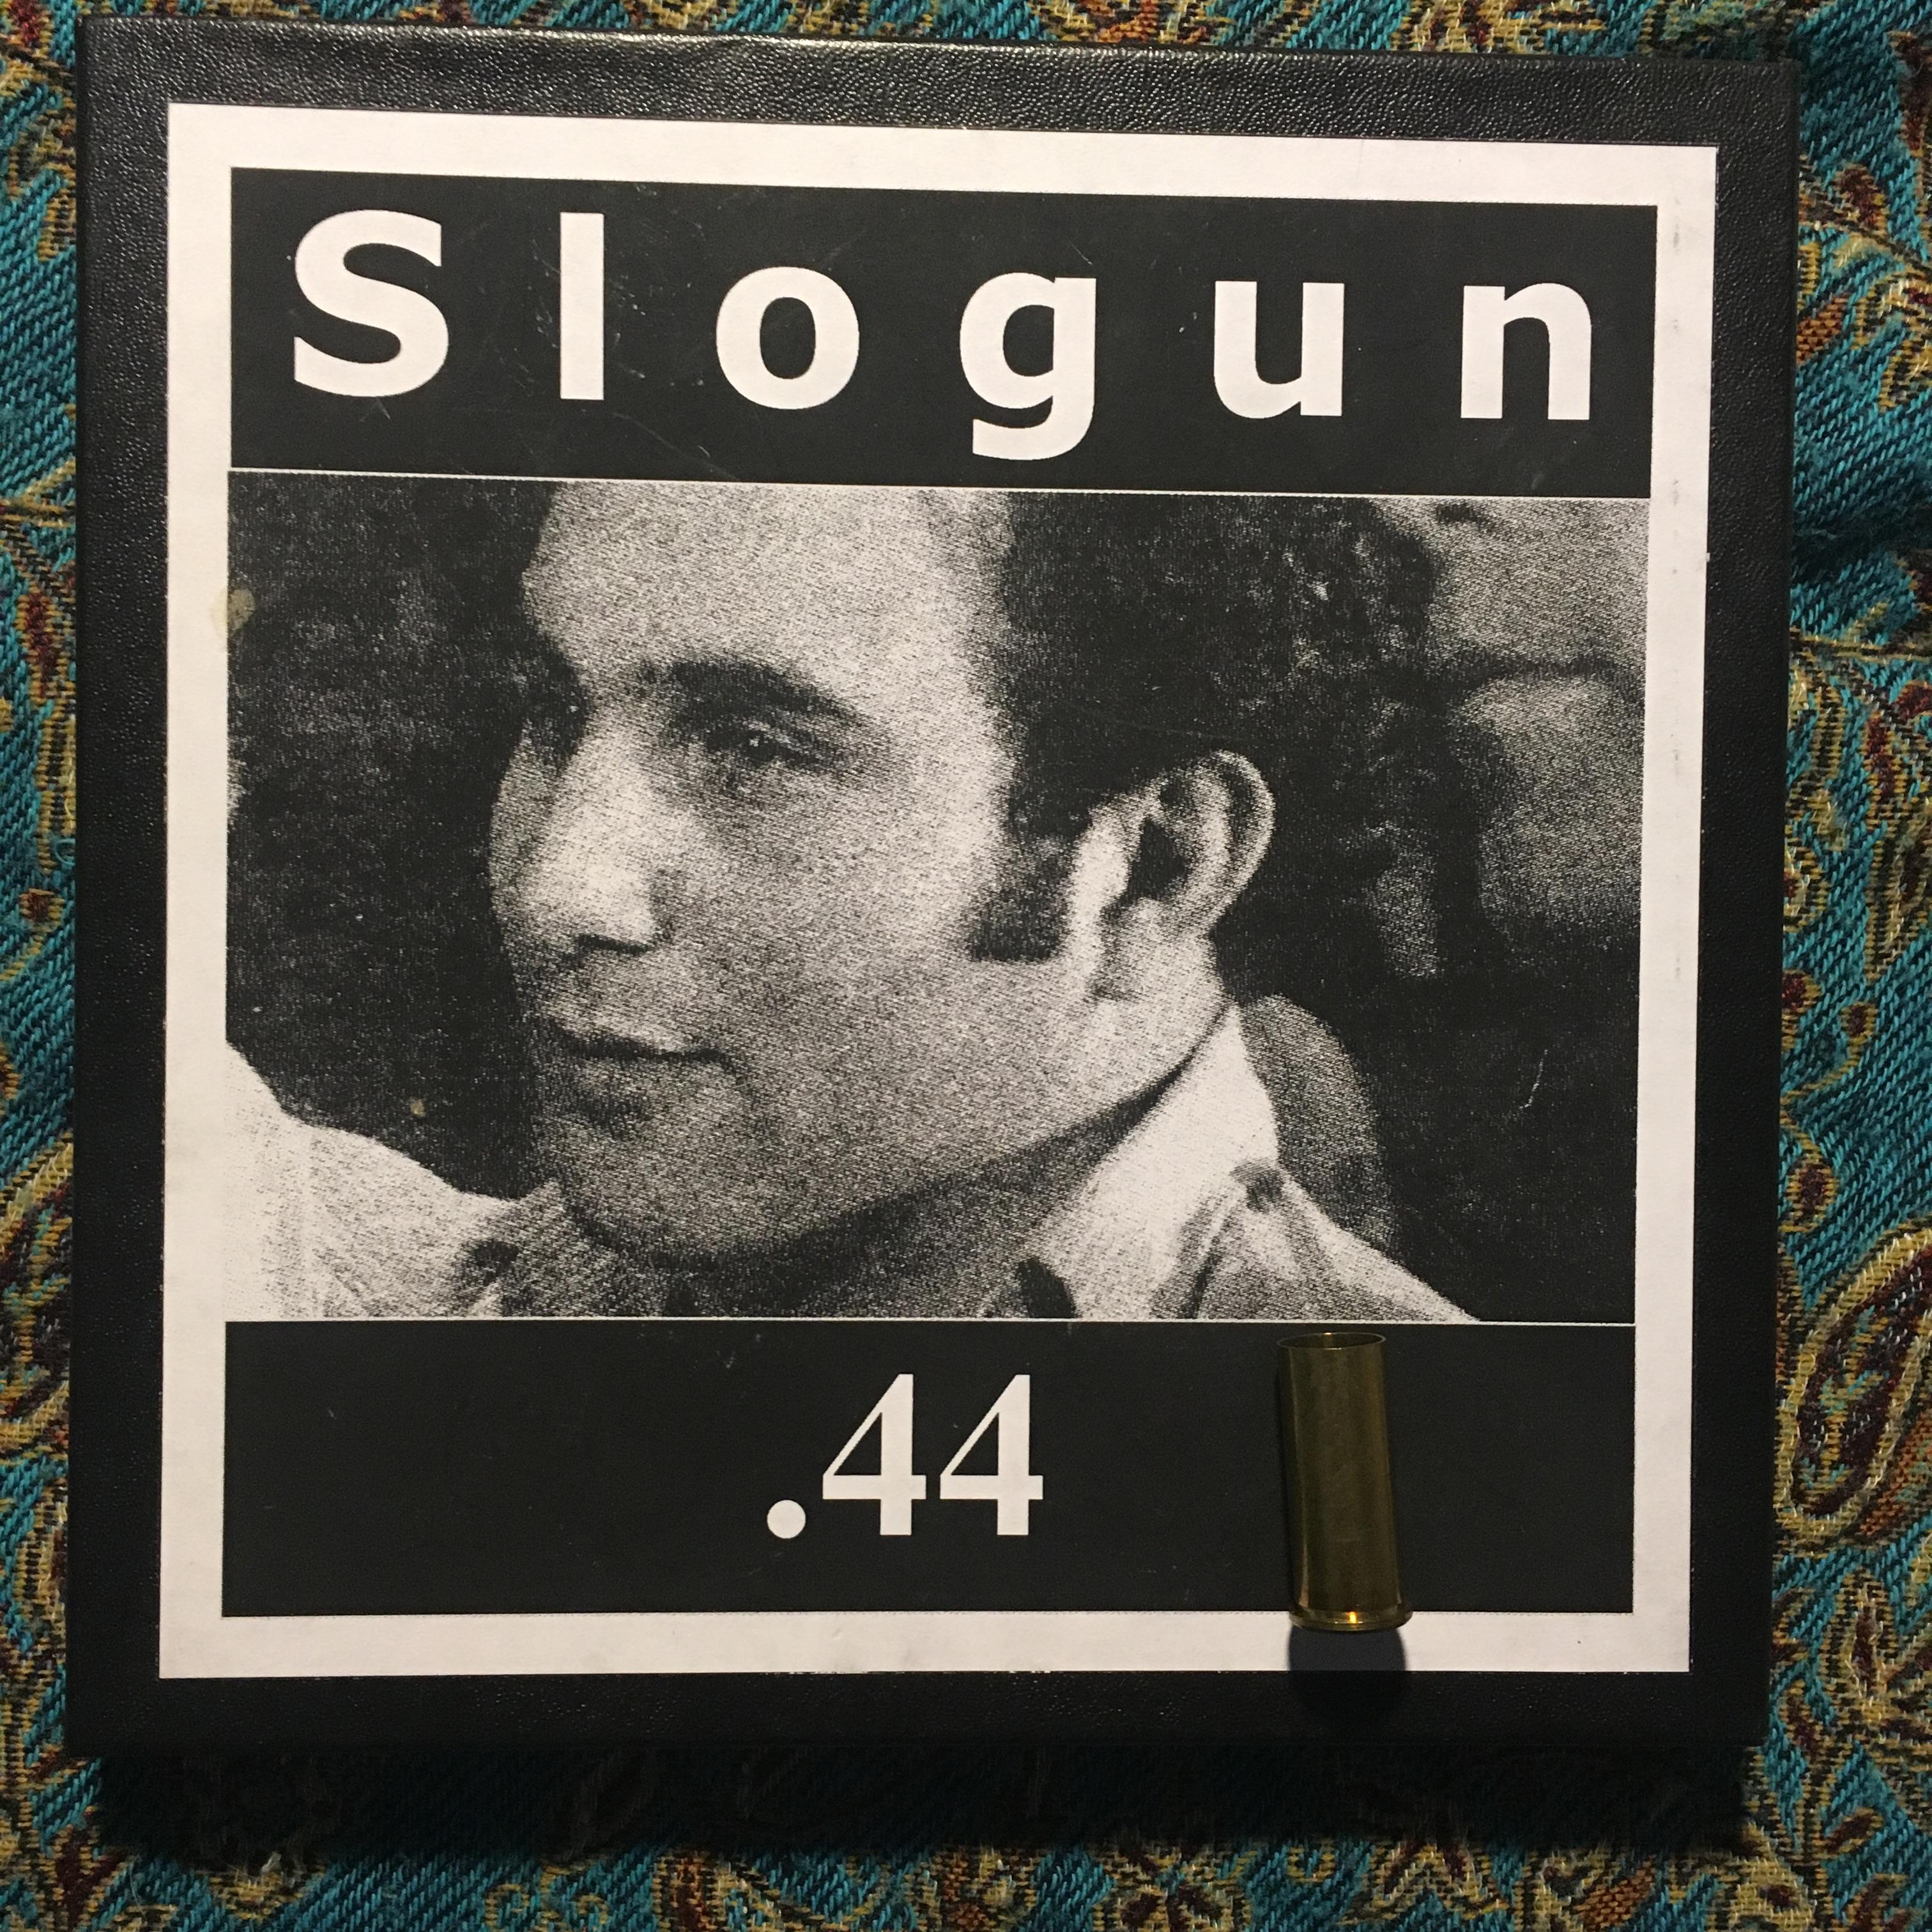 "SLOGUN – .44 (The Ultimate Evil) 7"" Box (+ shell casing)"